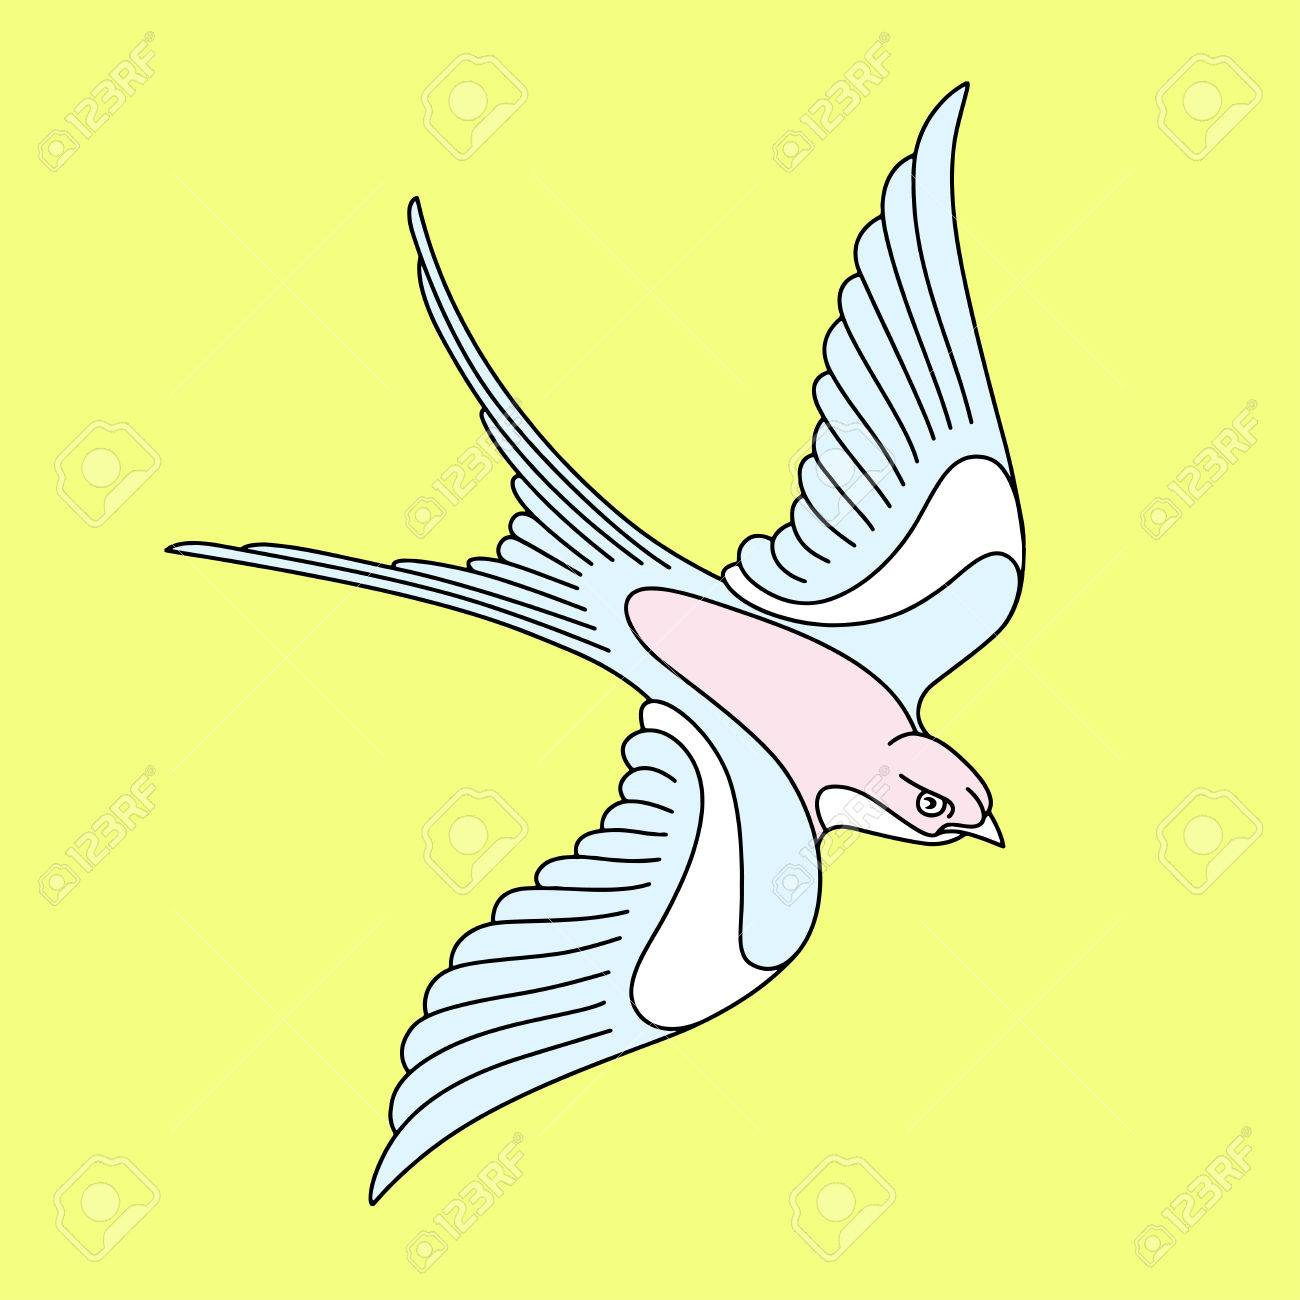 Flying Swallow Or Swift Tattoo Design. Elegant Bird Vector ...